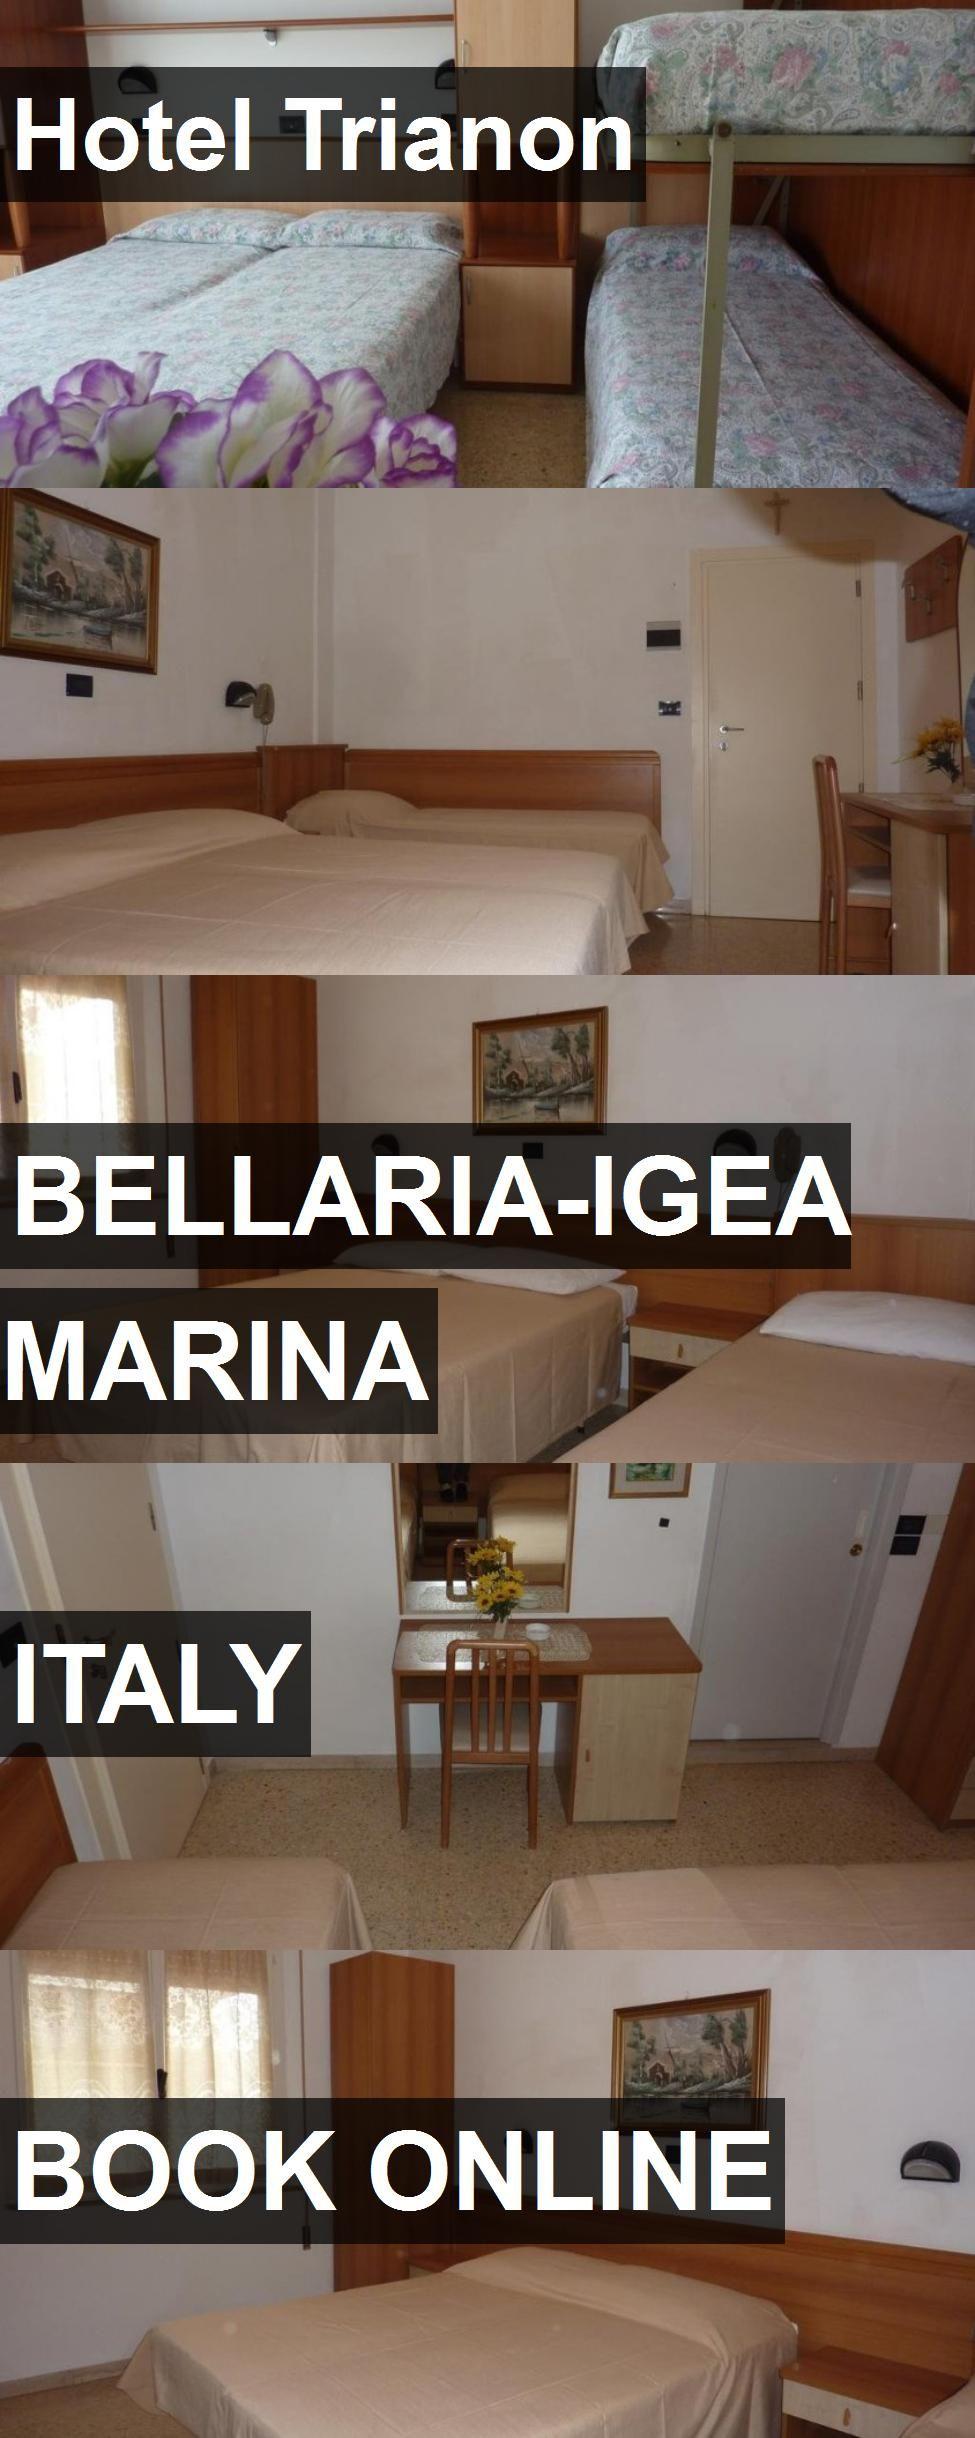 Hotel Trianon in BellariaIgea Marina, Italy. For more